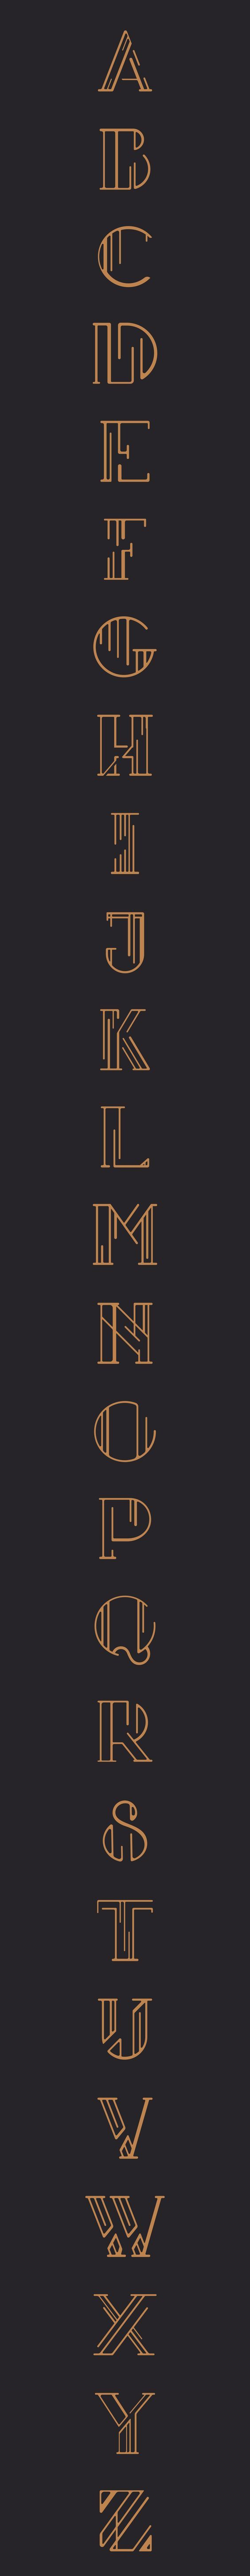 Noelito Flow Typography Pinterest Noel Flow And Songs